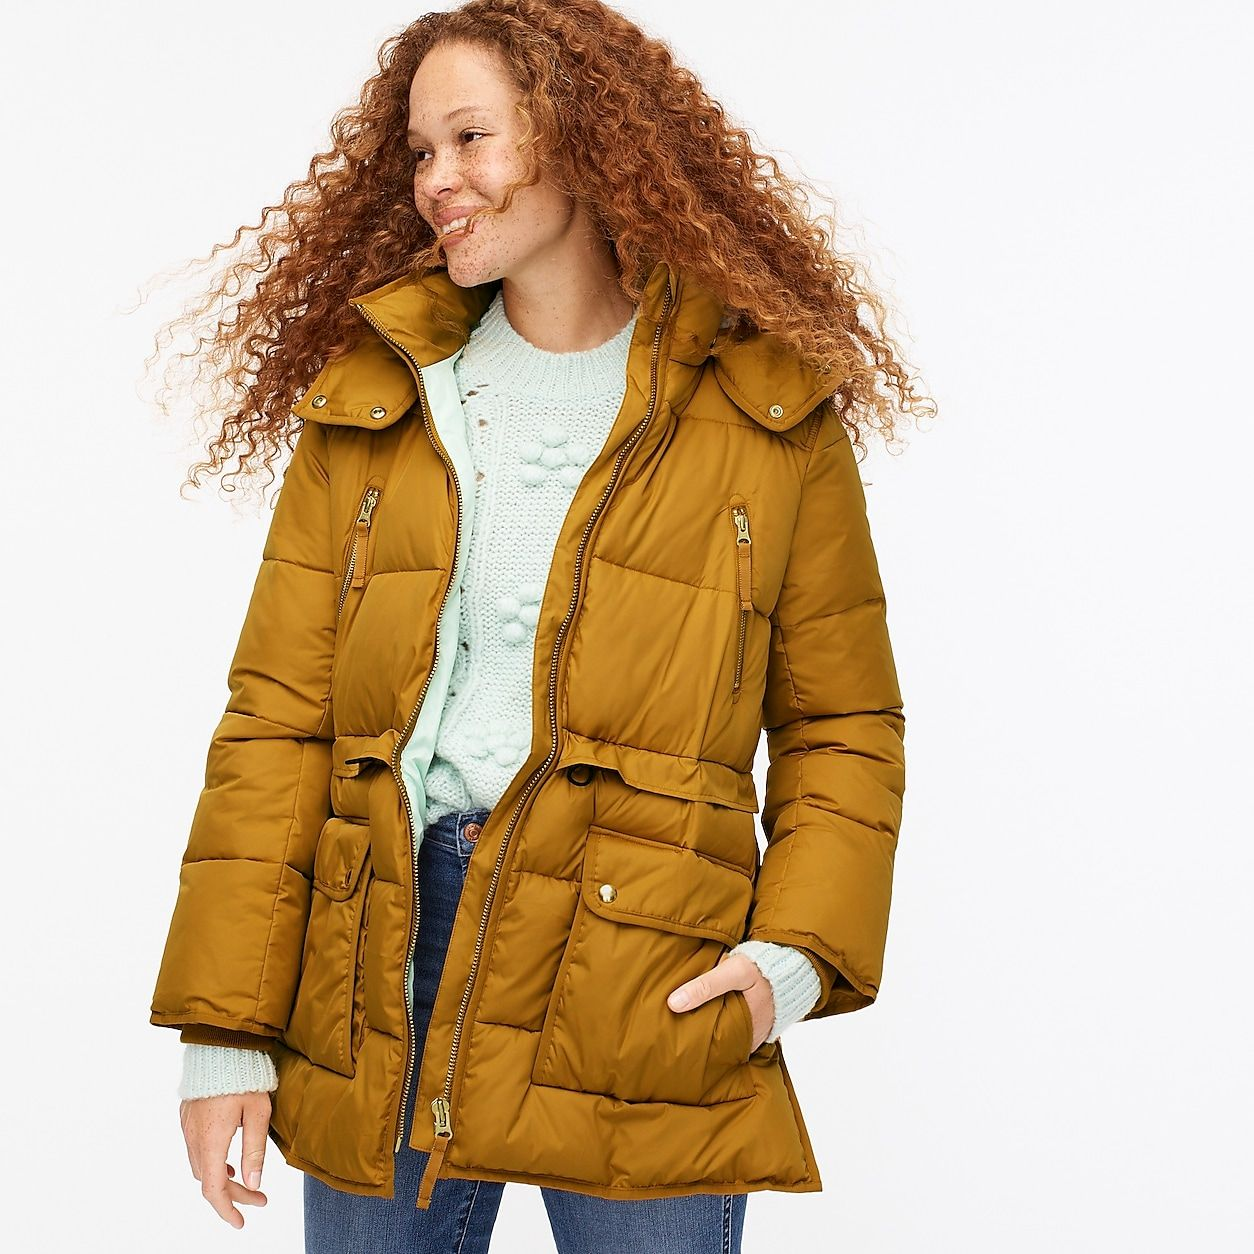 Petite Chateau Puffer Jacket With Primaloft Jackets Outerwear Women Puffer Jackets [ 1254 x 1254 Pixel ]